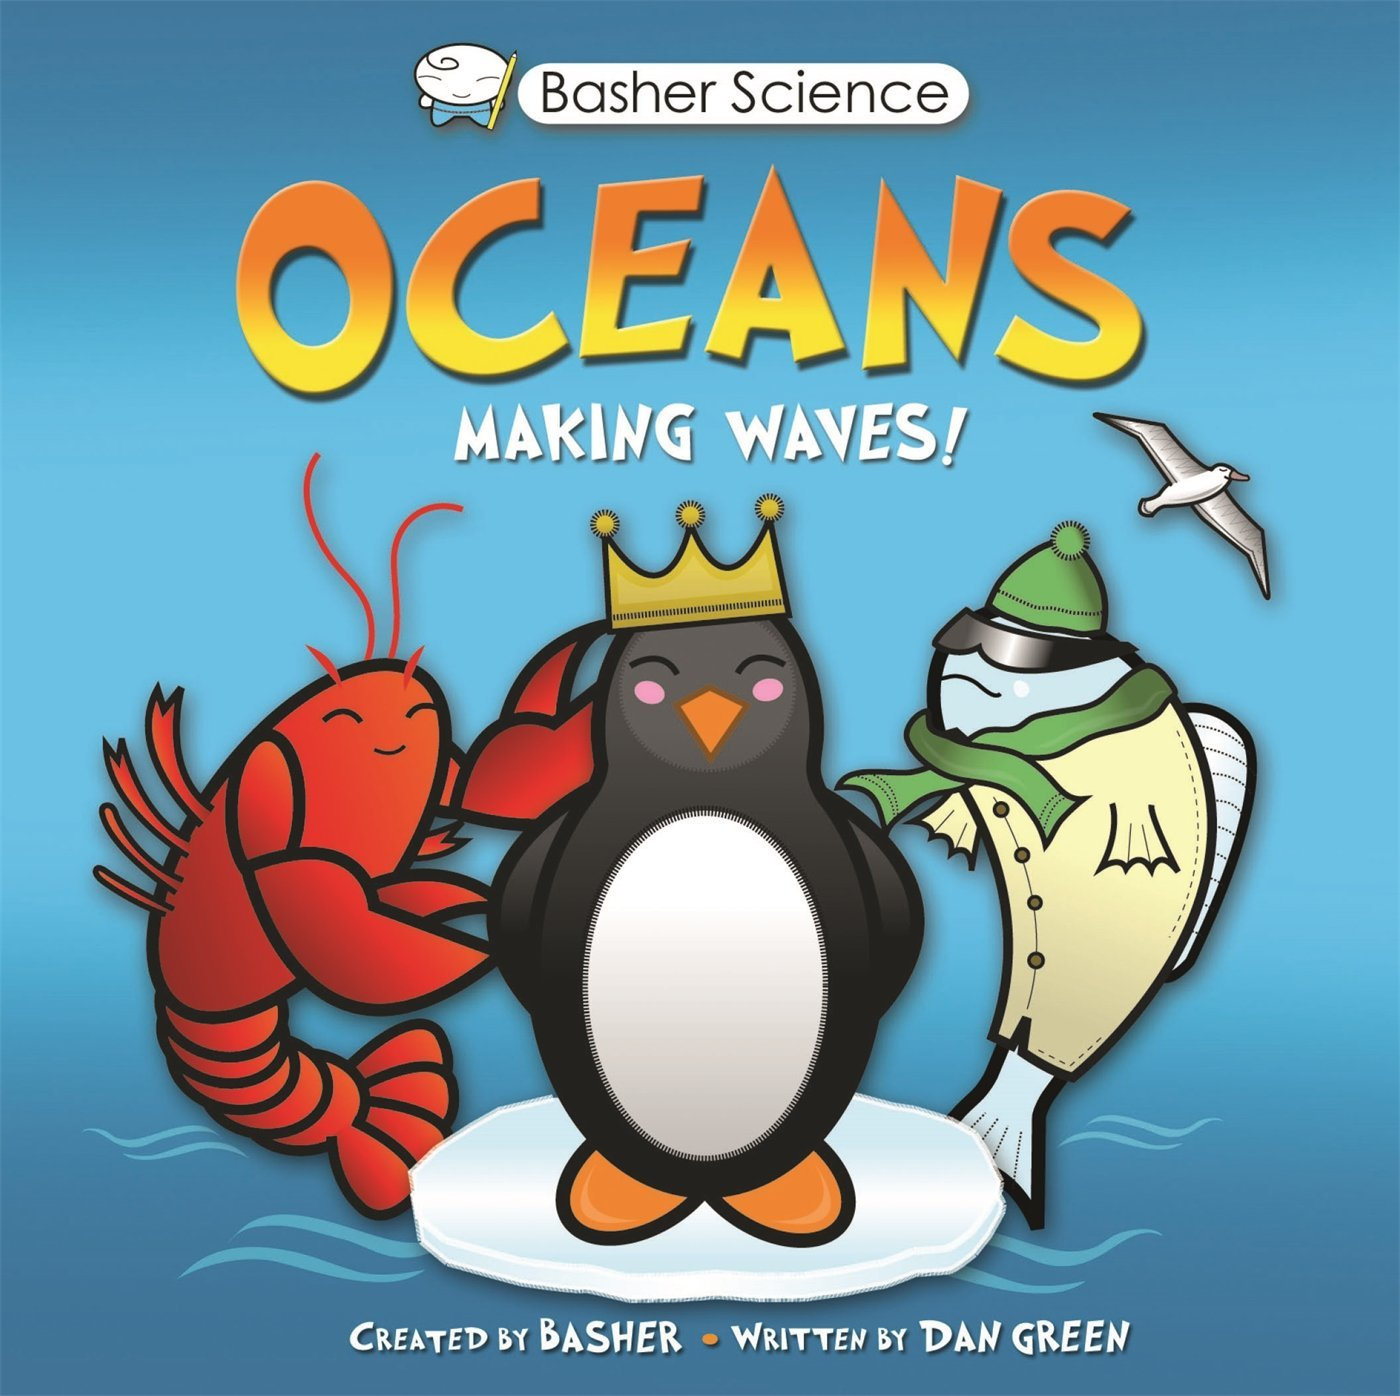 Basher science oceans making waves simon basher dan green basher science oceans making waves simon basher dan green 9780753468227 amazon books gamestrikefo Gallery